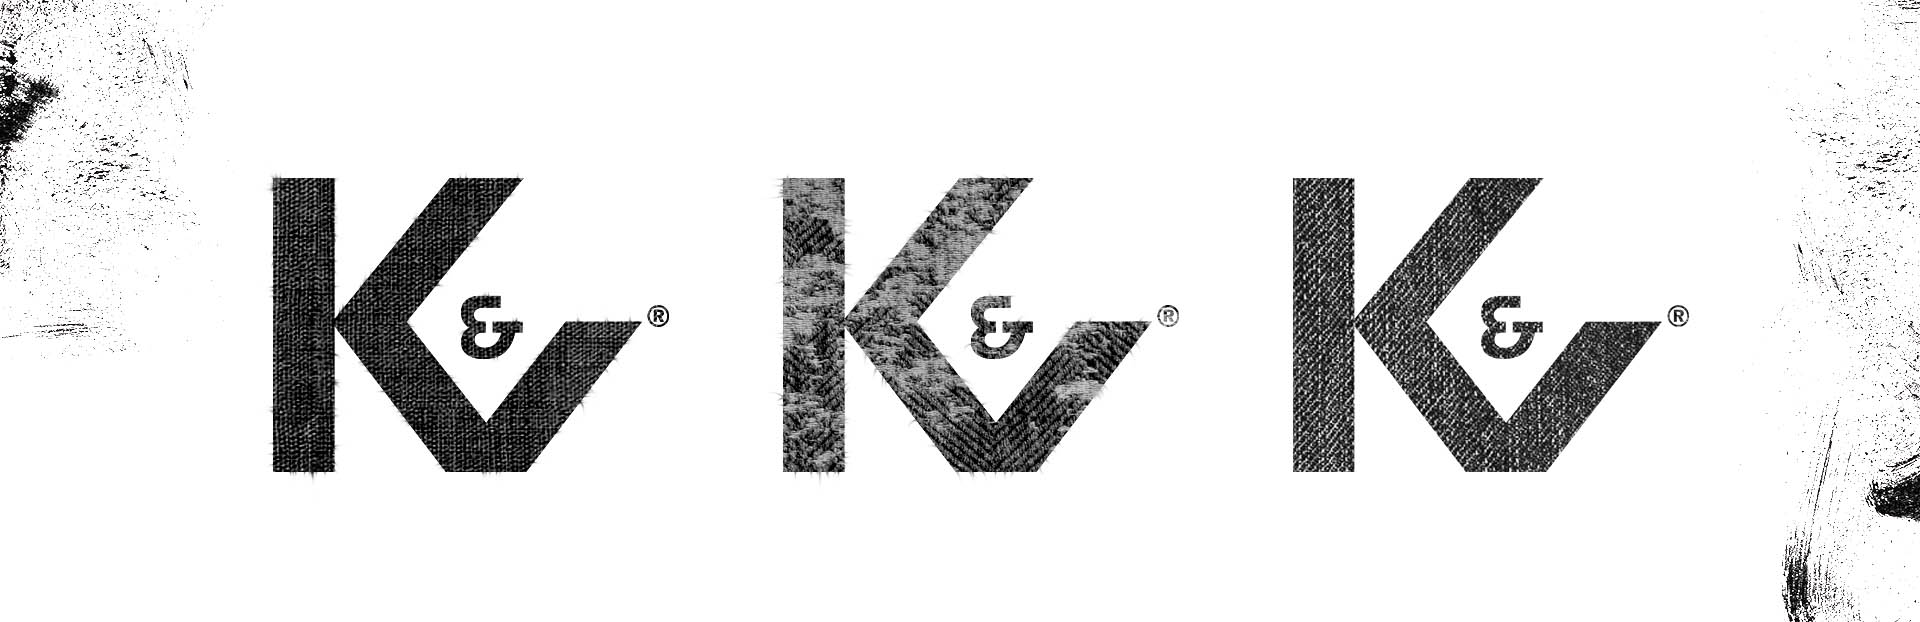 Logo design for a fashion clothing company